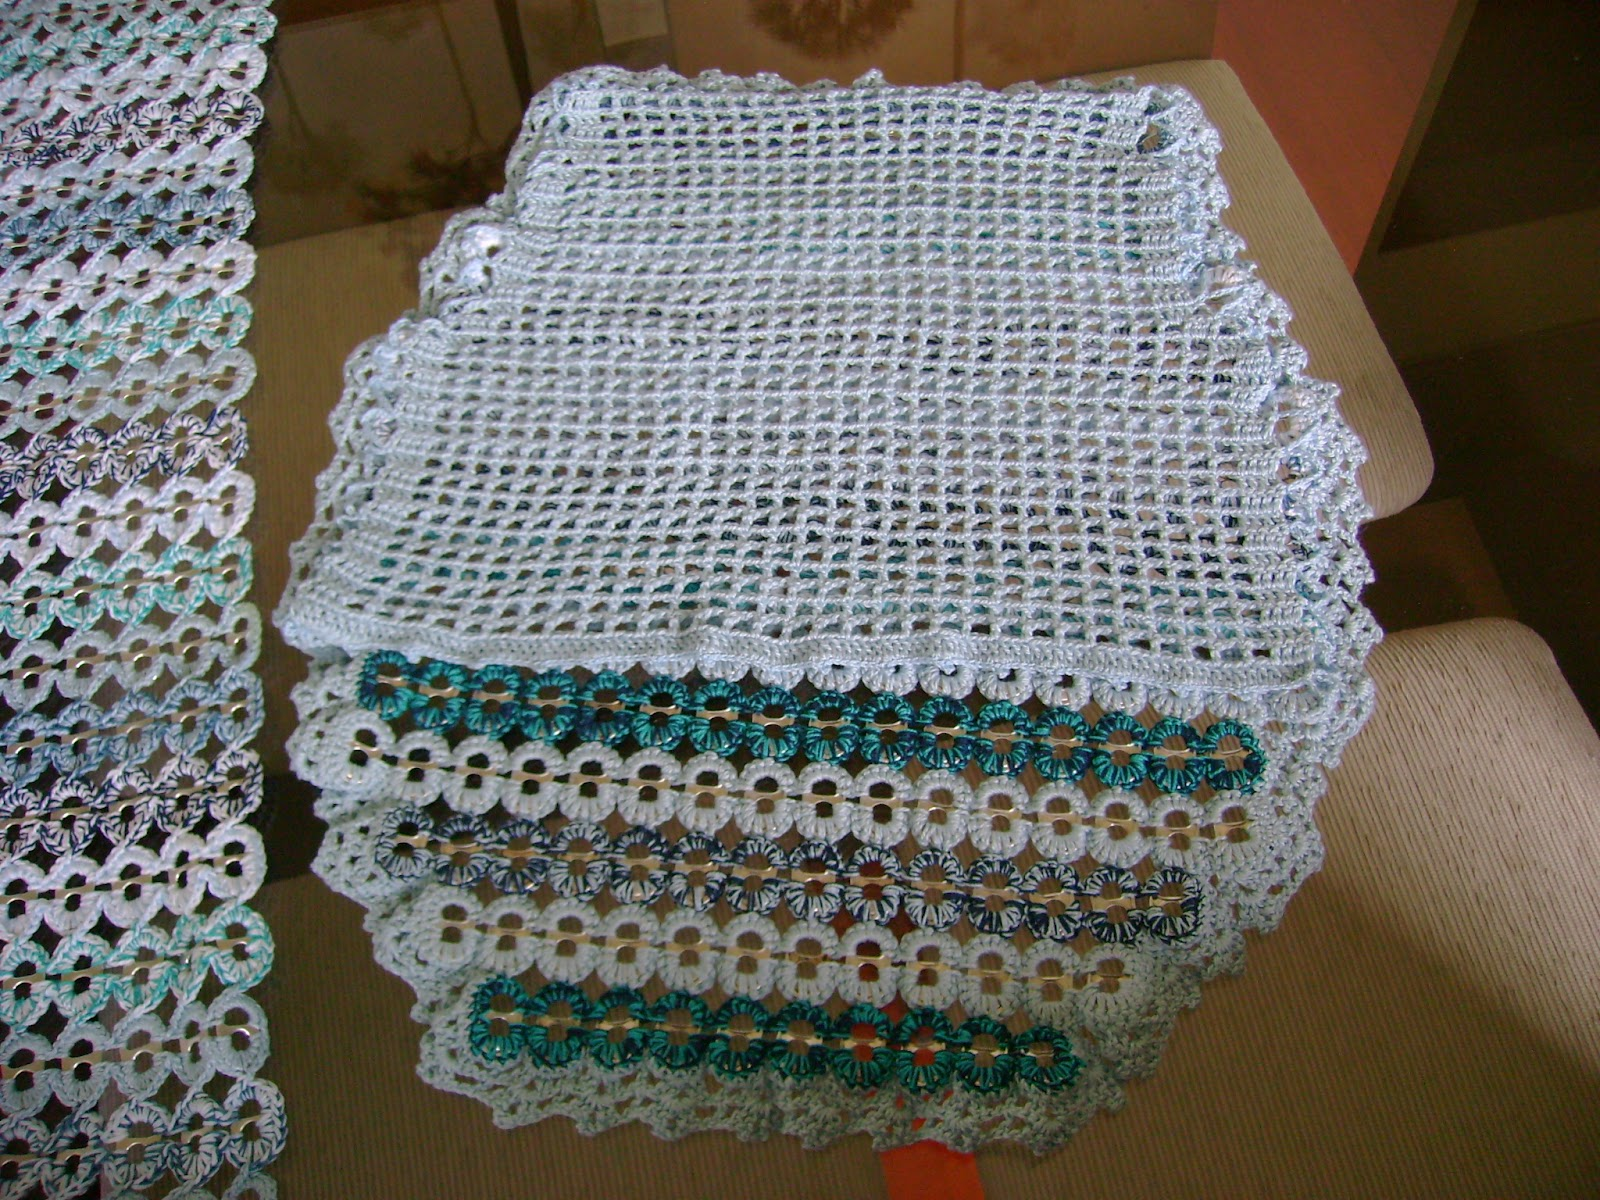 Tapetes de Crochê: Agosto 2012 #654327 1600 1200